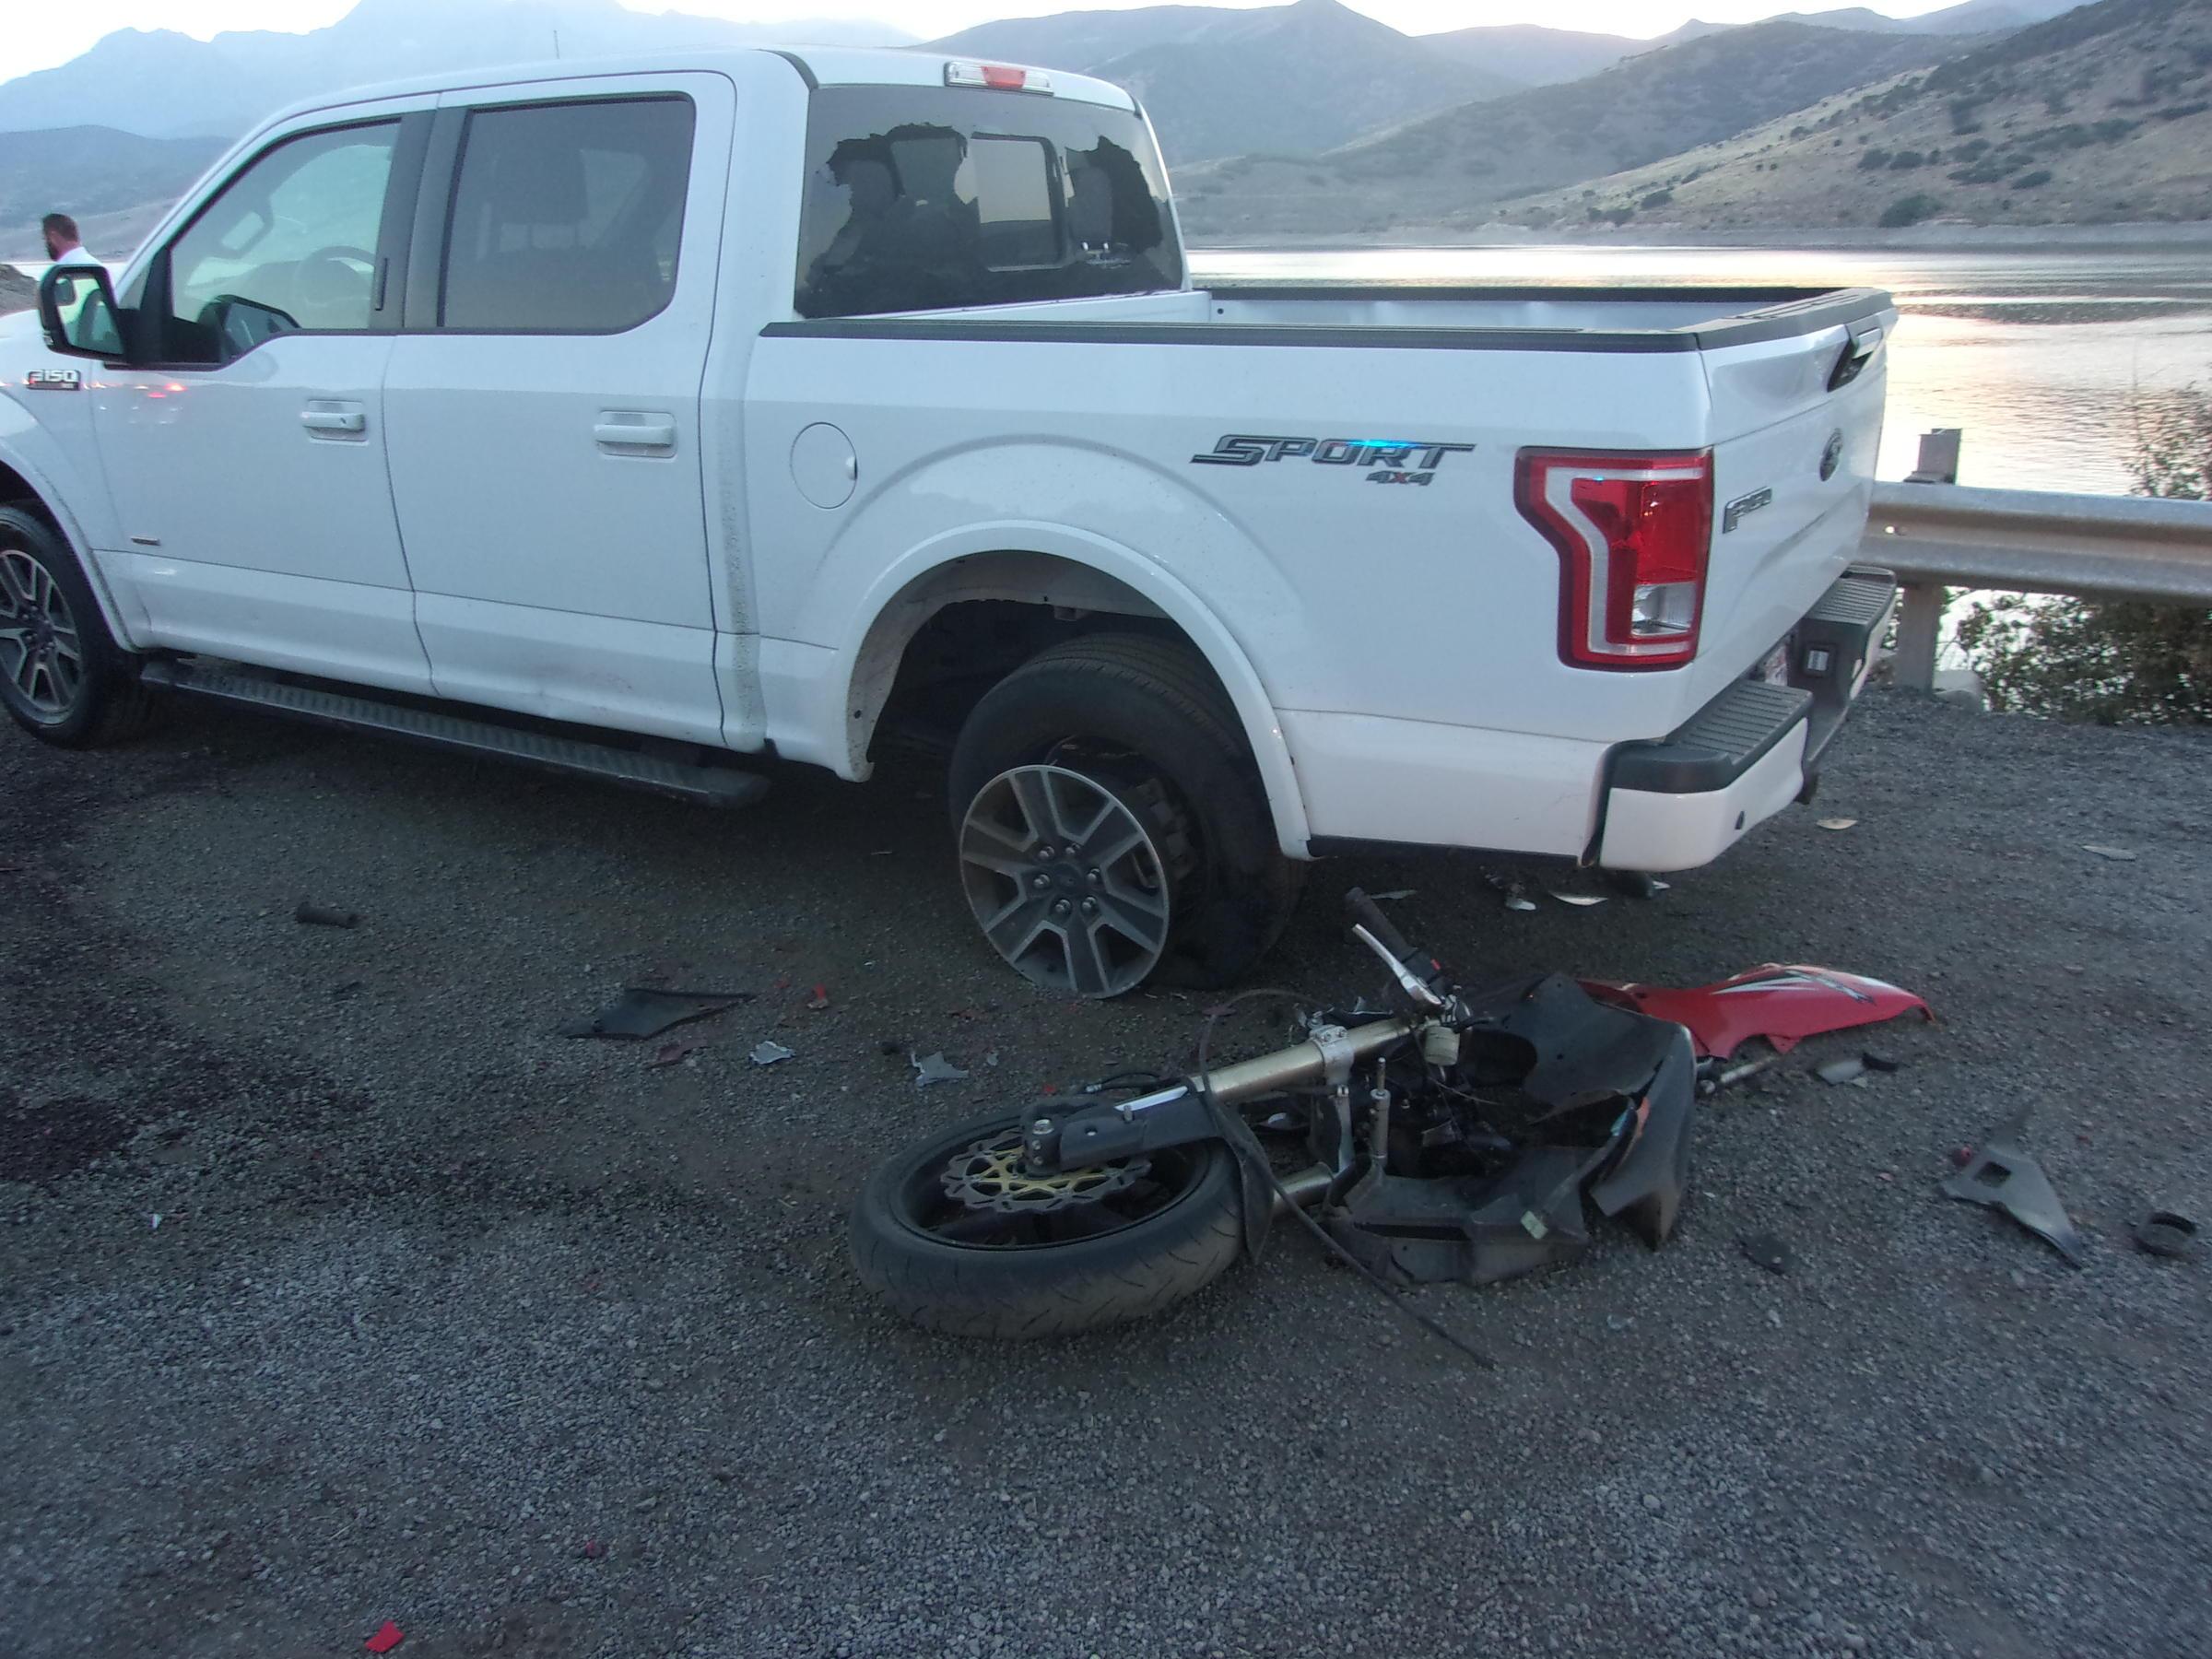 Motorcycle Crash Near Deer Creek | KPCW